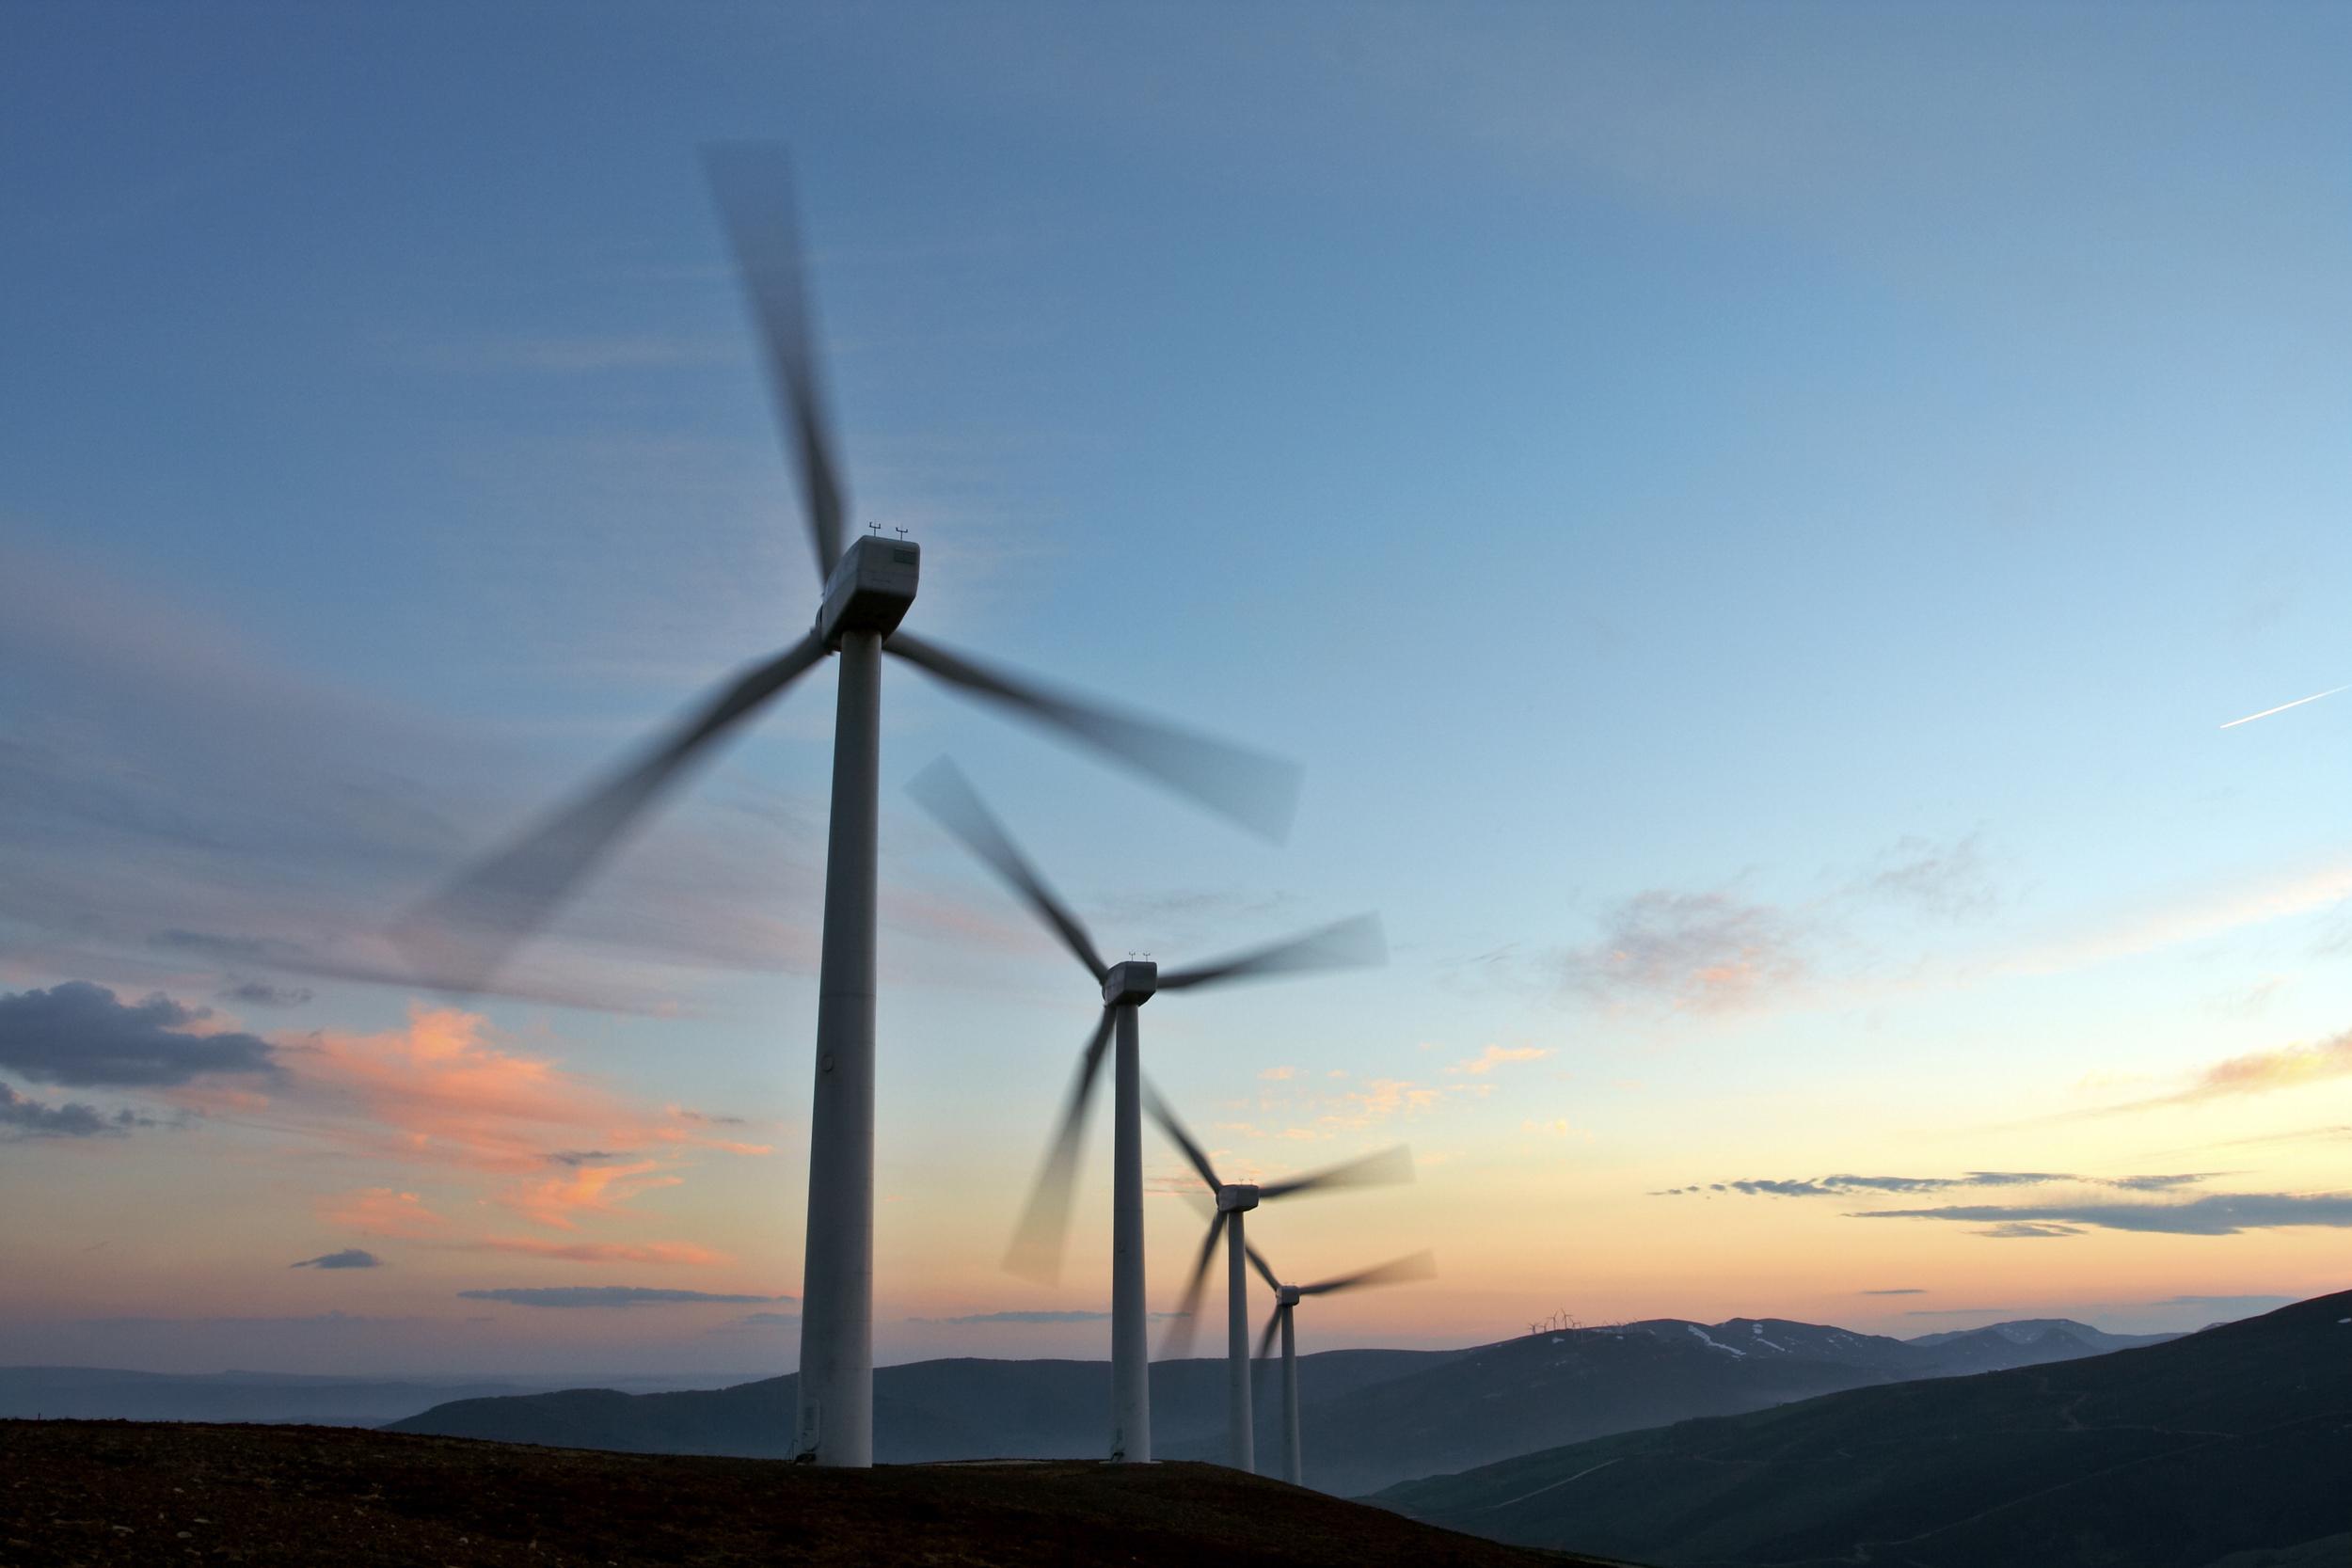 bigstock-Wind-Turbine-Farm-Turning-mov-517106.jpg